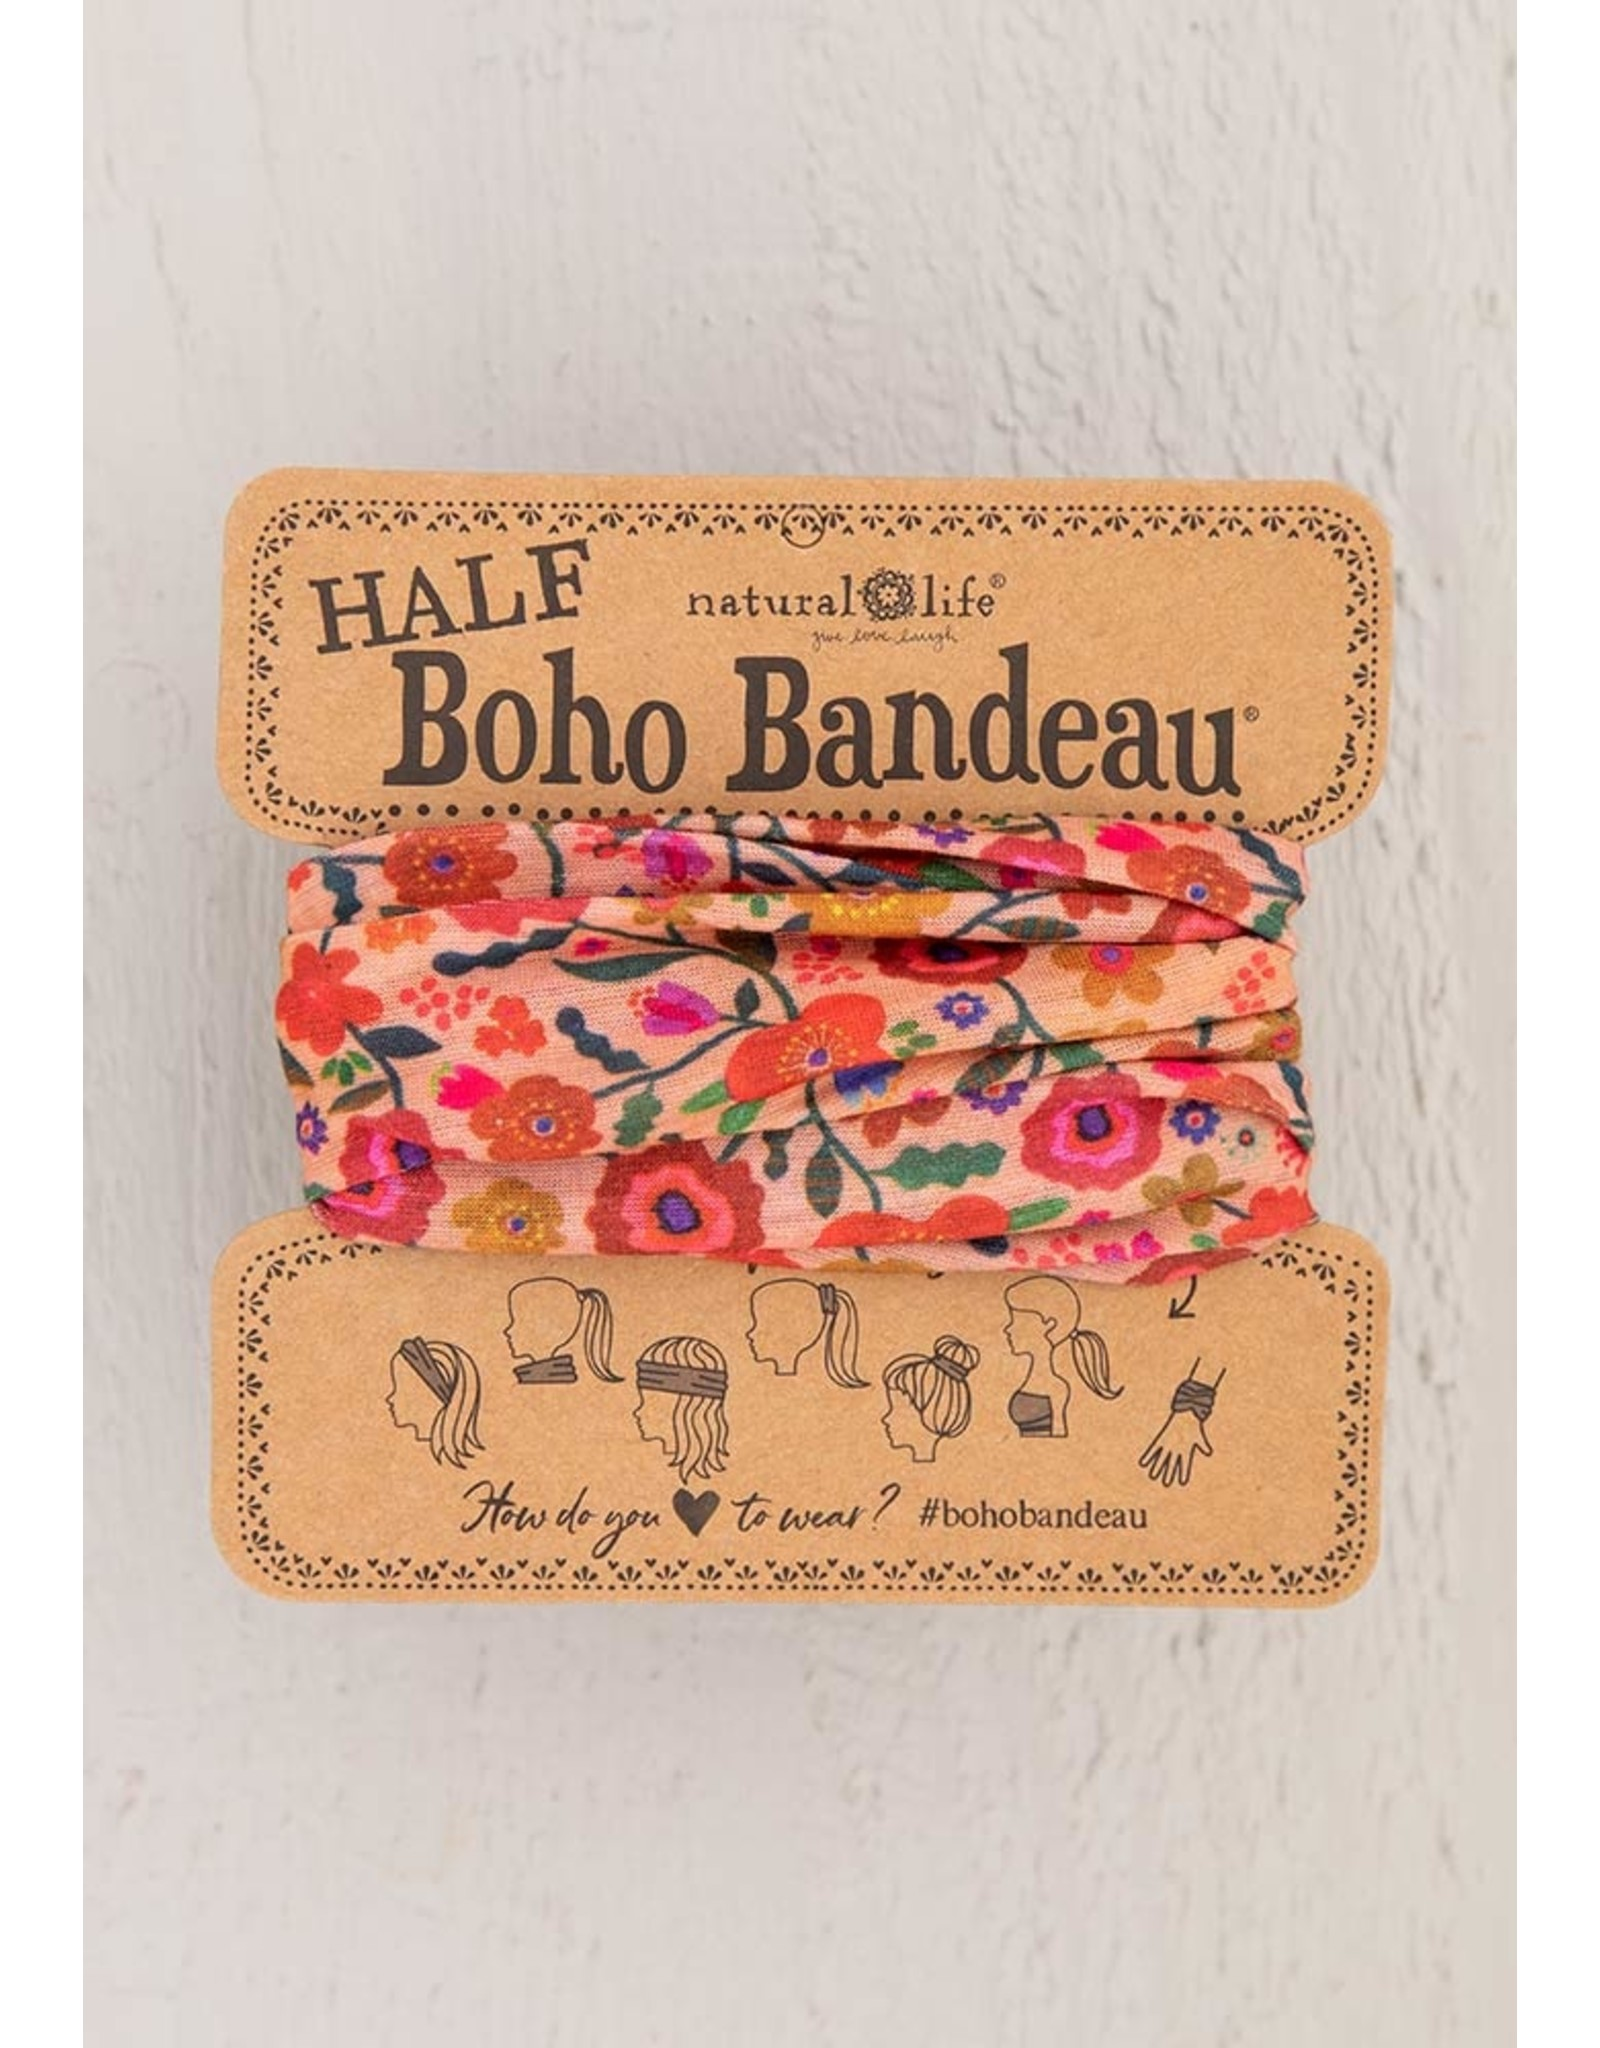 Natural LIfe Half Boho Bandeau, Blush Floral